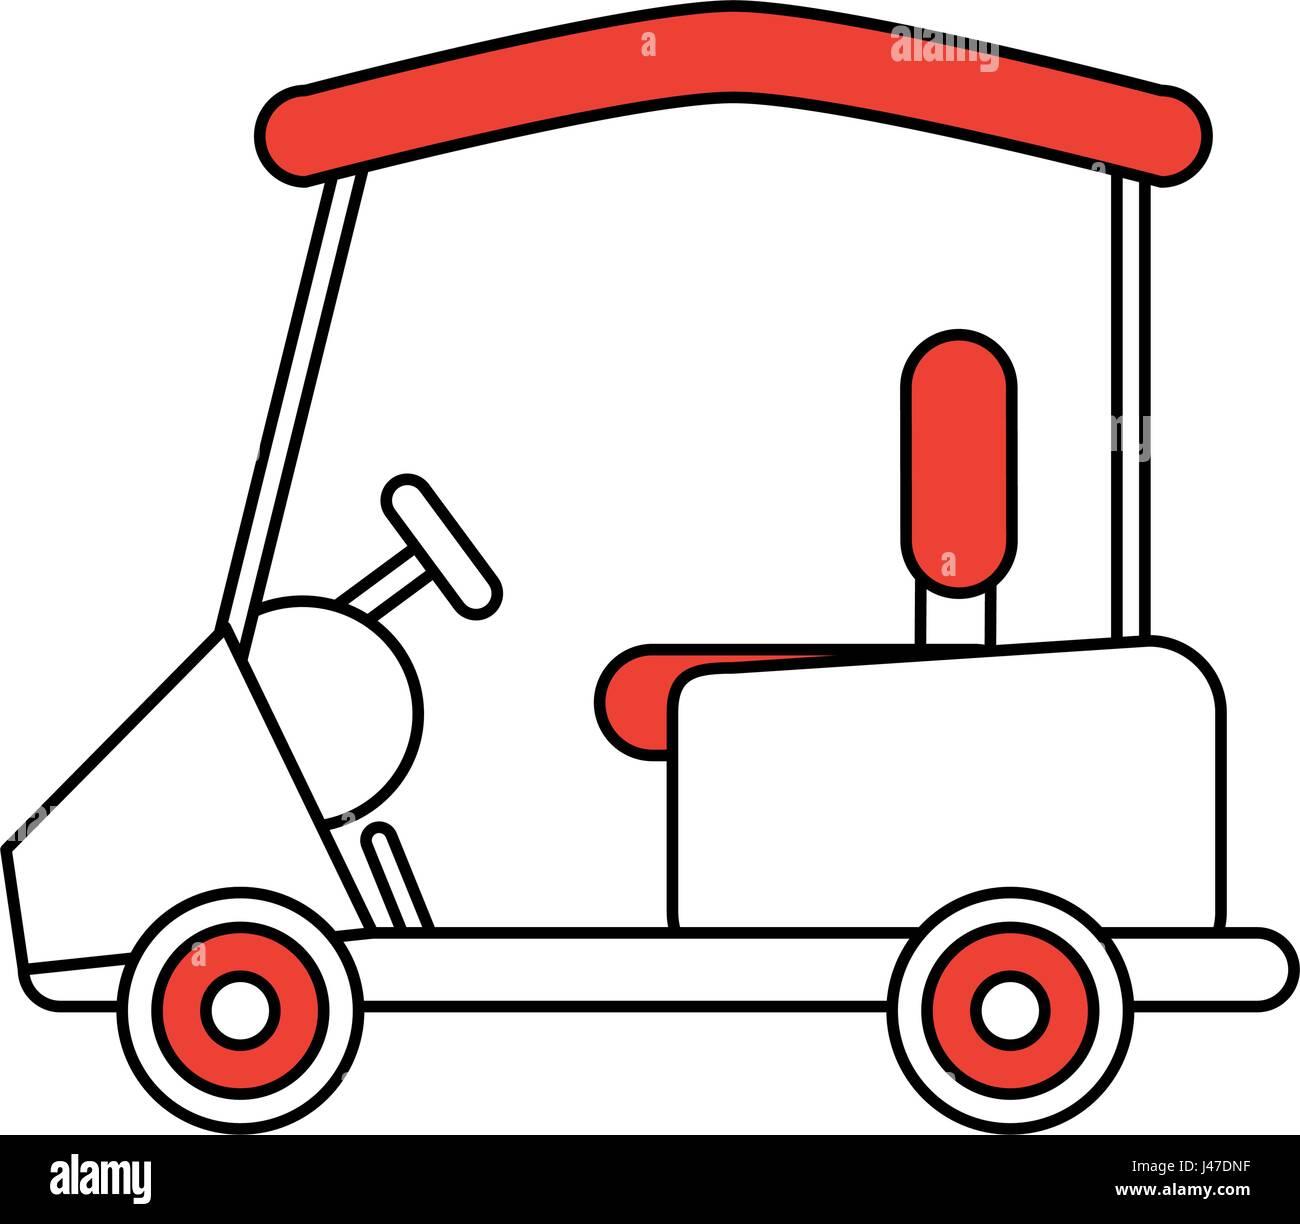 Color Silhouette Cartoon Golf Cart Vehicle Stock Vector Image Art Alamy